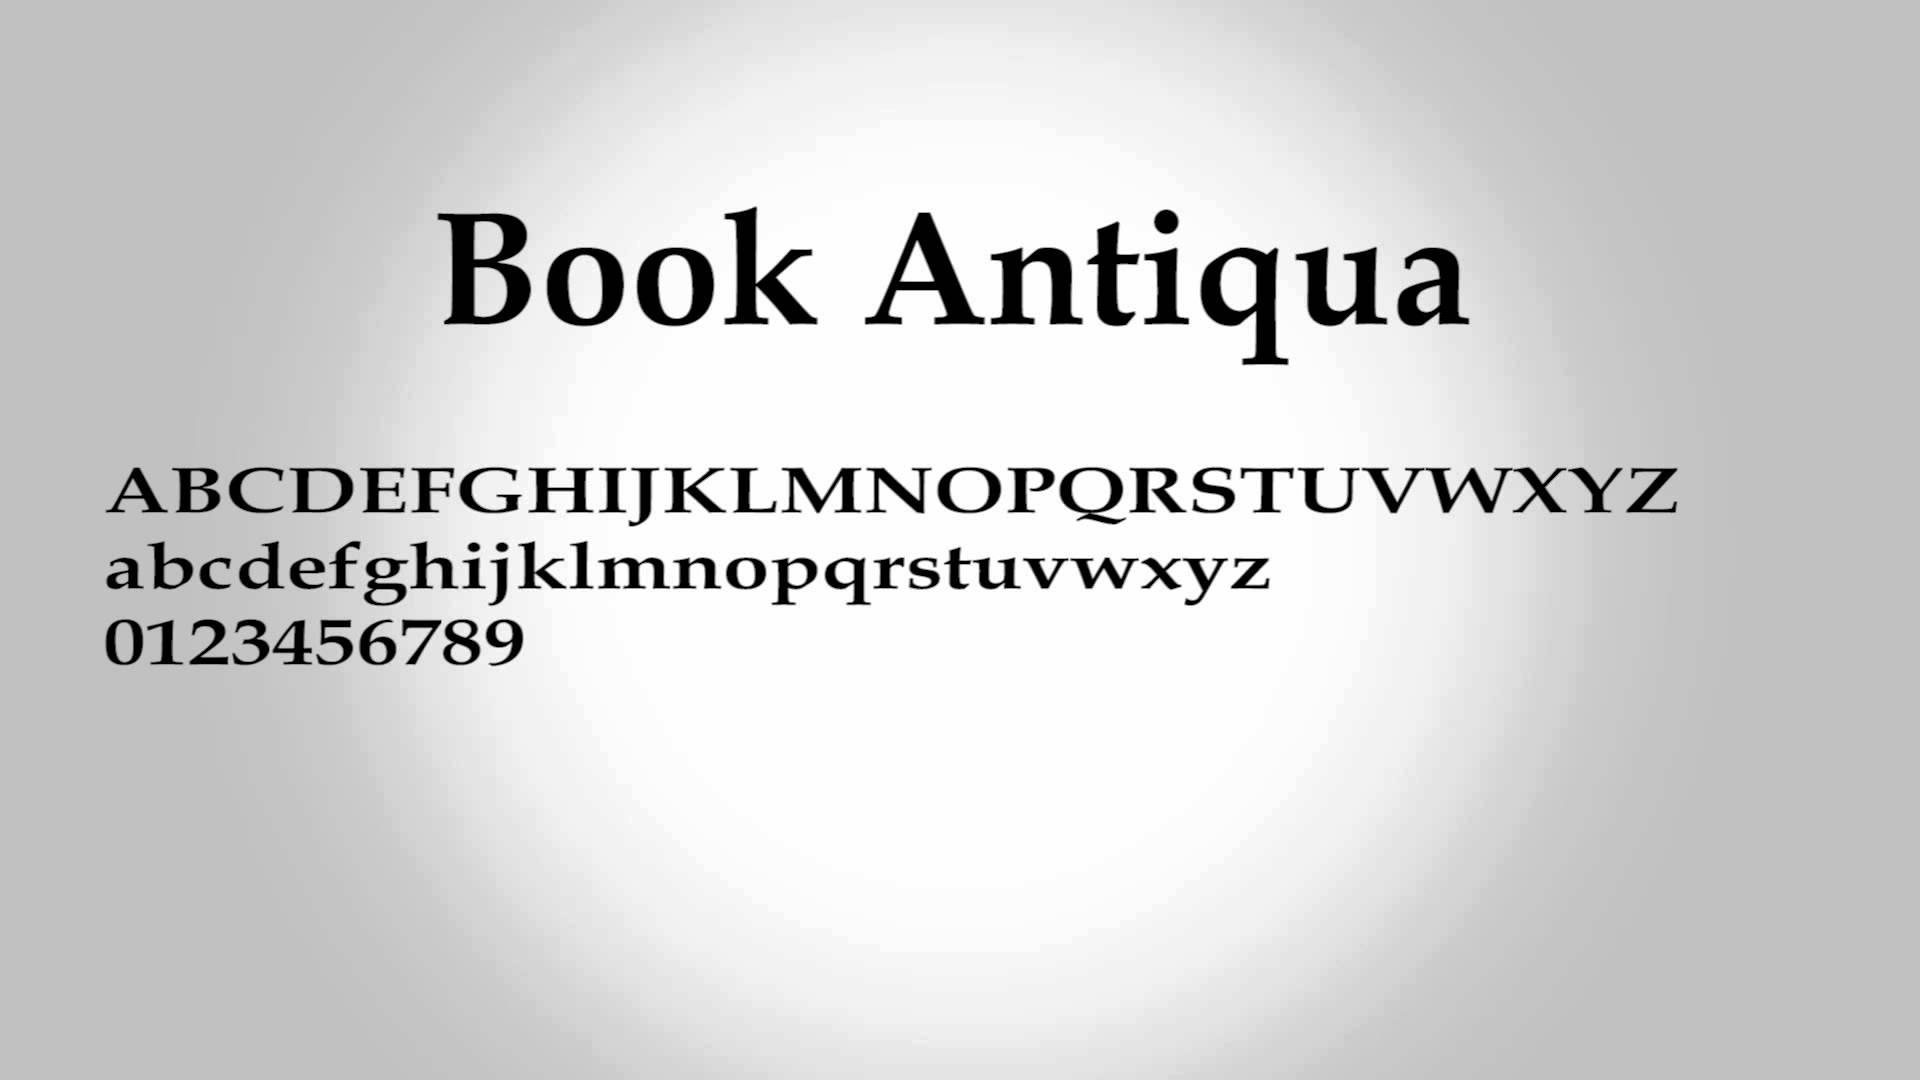 Book Antiqua_font_for_resume _photo